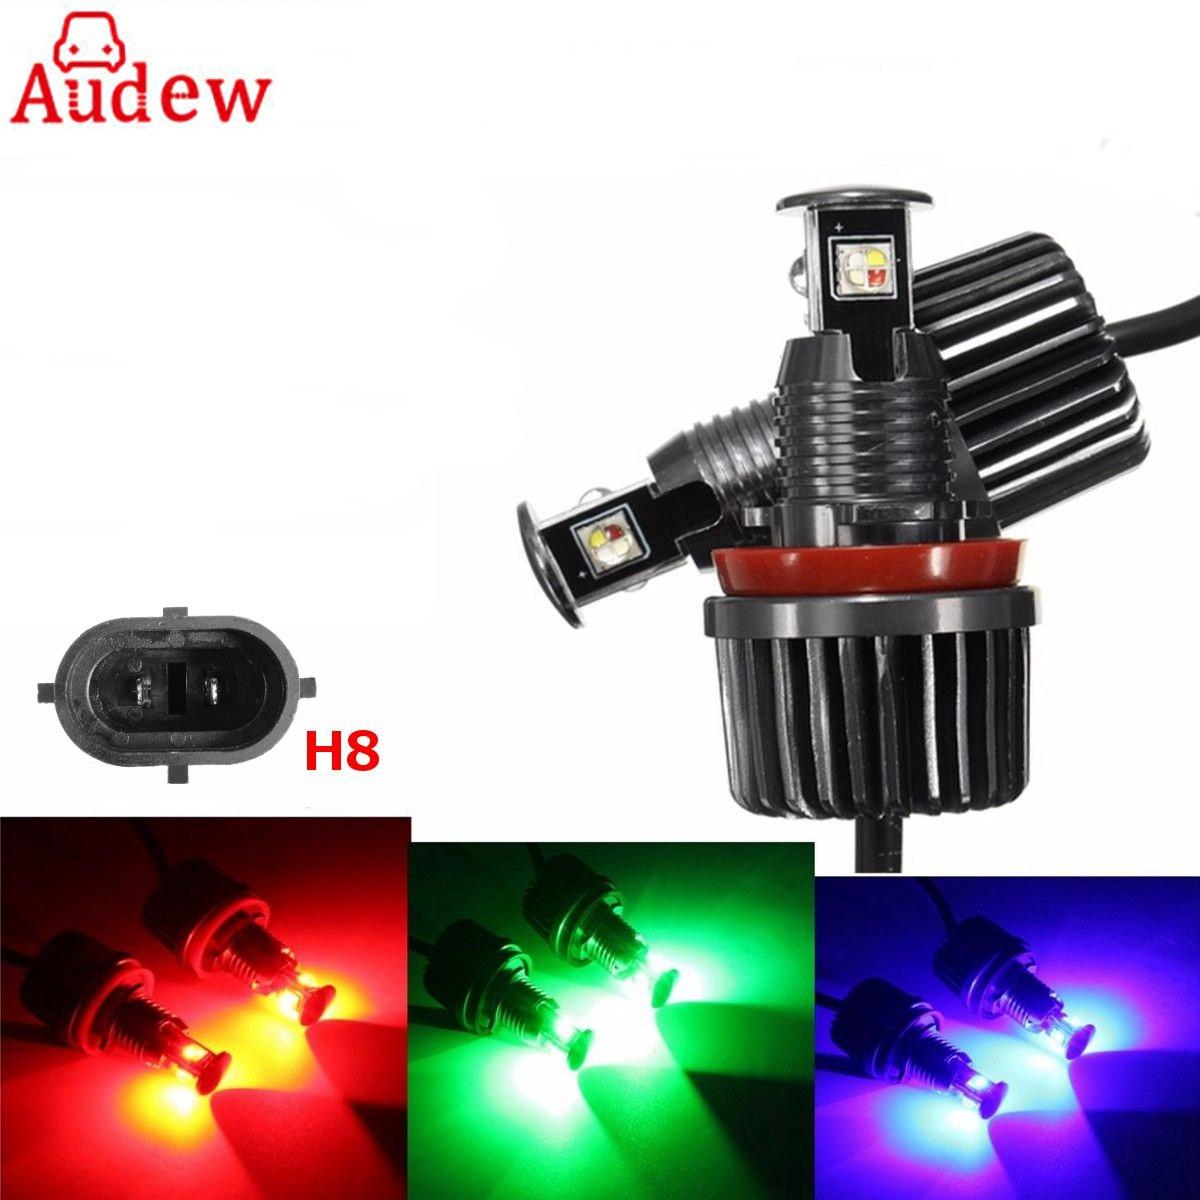 1Pair Car LED Light Bulb WIFI Control RGB Color Change Angel Eye Light LED Bulb No Error For BMW E90 E92 E93 X5 keyshare dual bulb night vision led light kit for remote control drones